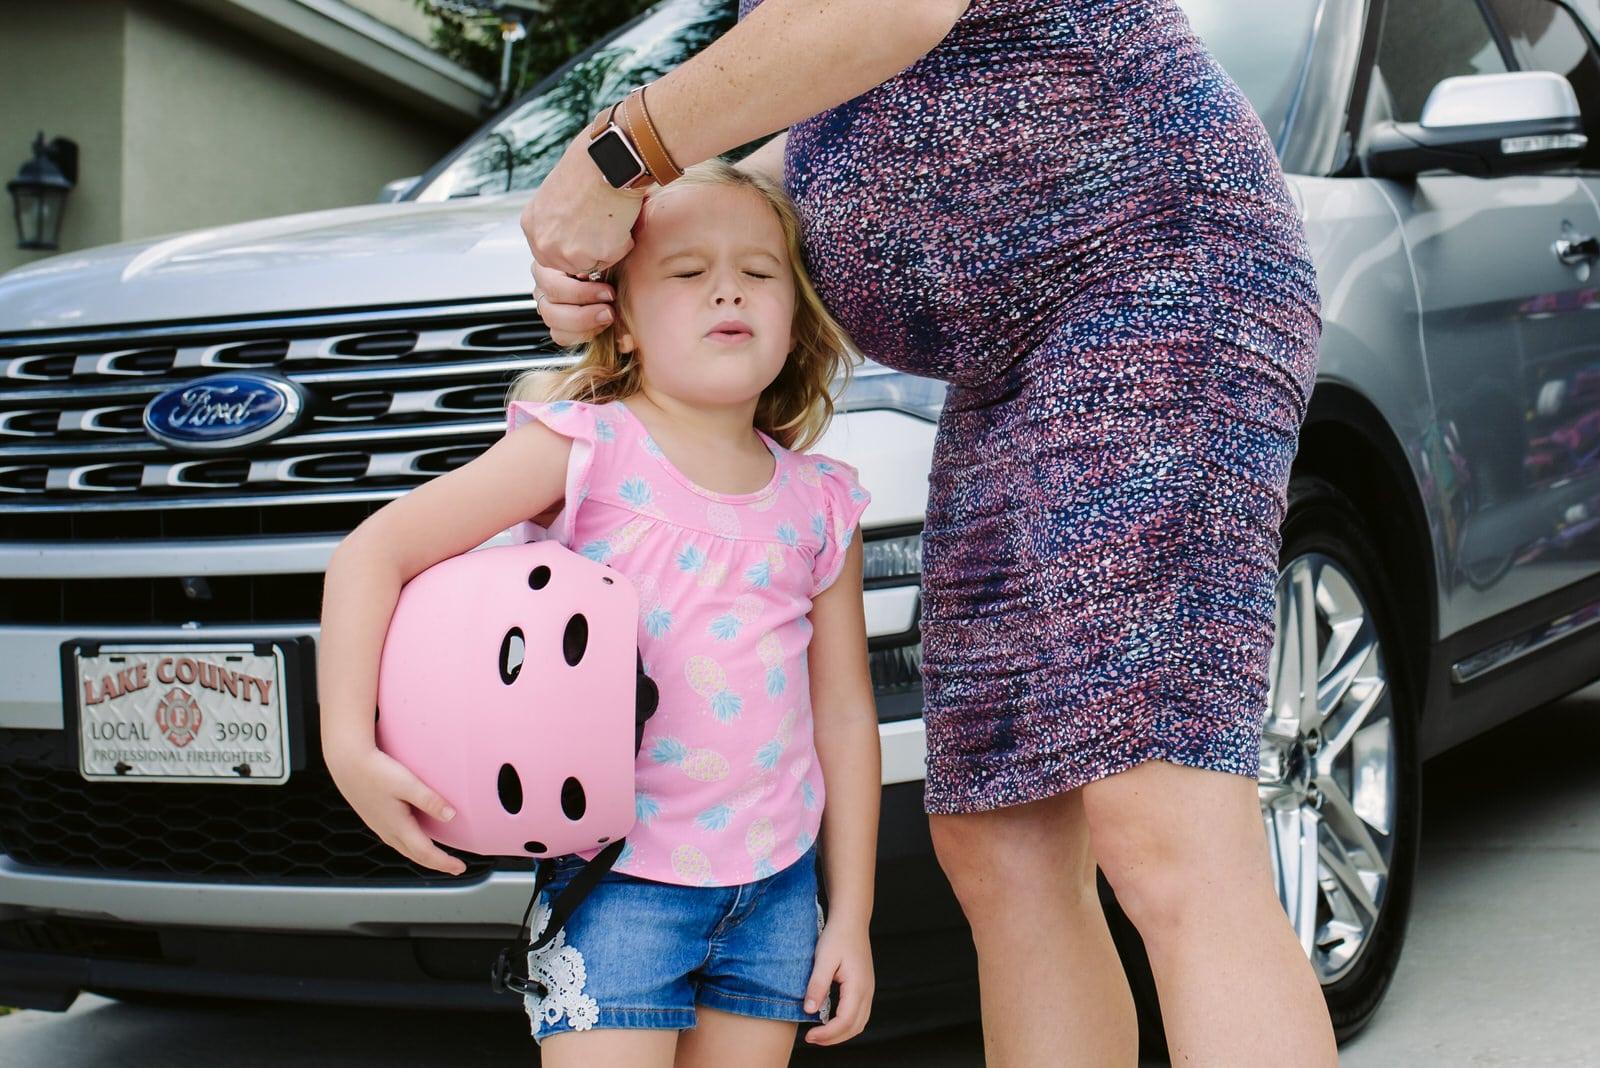 little girl winces as mom fixes hair